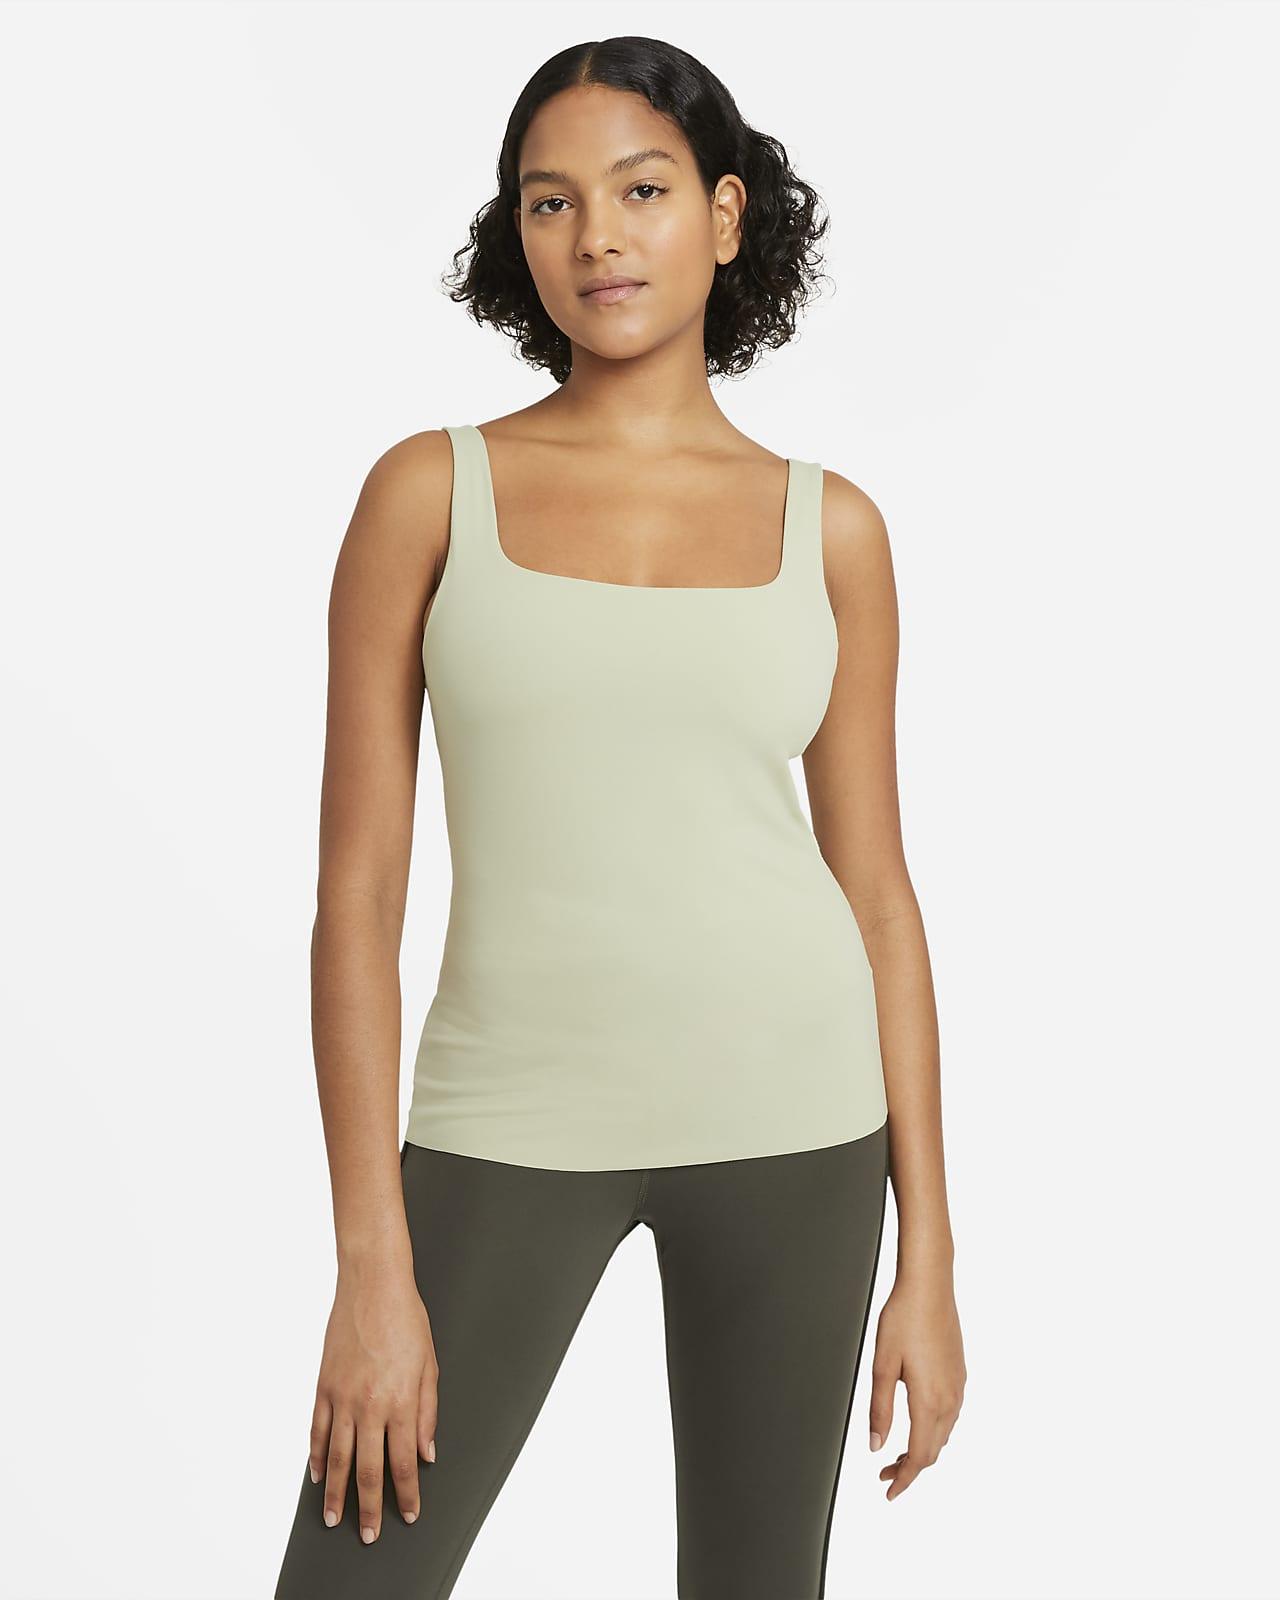 Nike Yoga Luxe Women's Shelf-Bra Tank